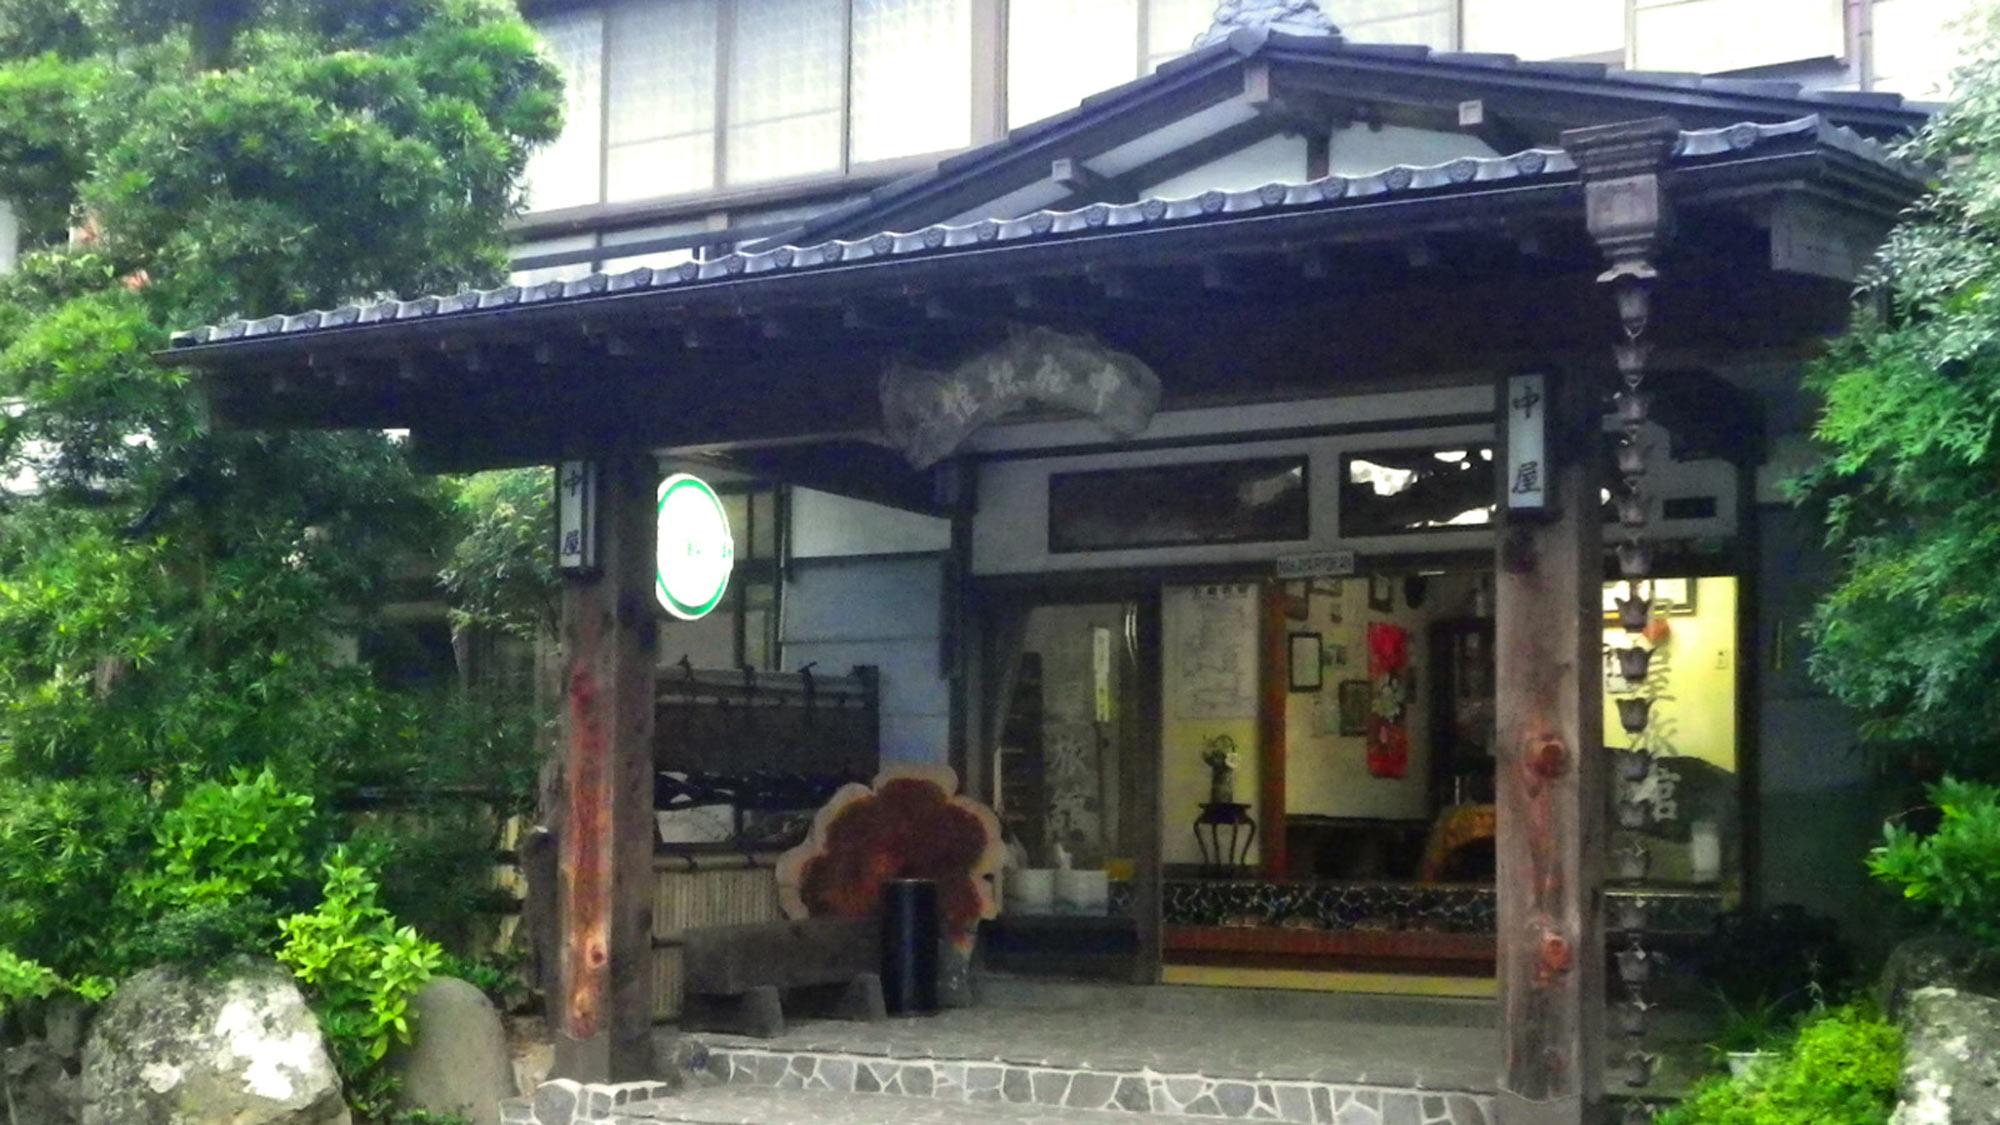 七沢温泉 中屋旅館のnull